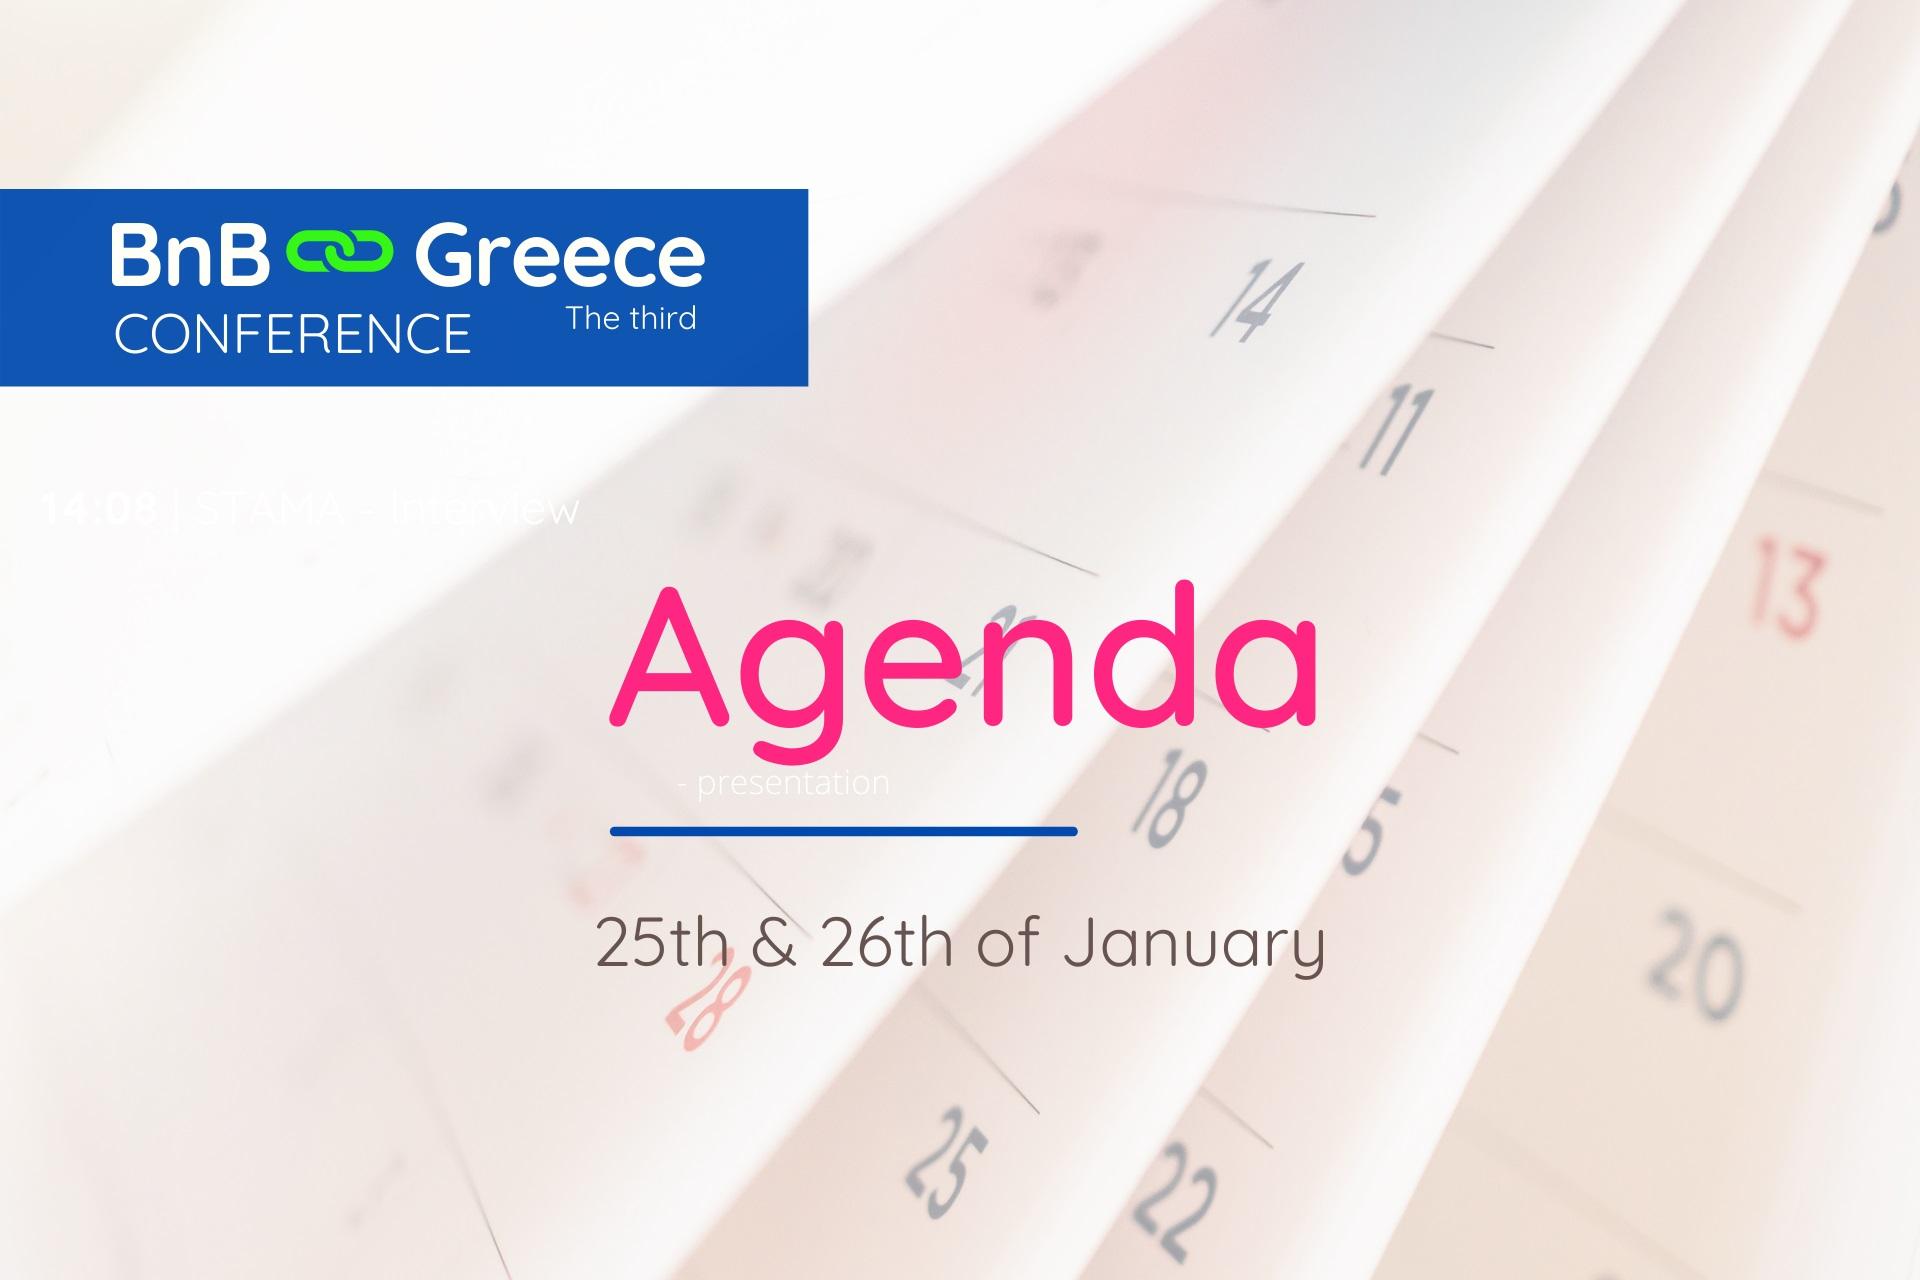 3o BnB Greece Conference: Πιστό στο ραντεβού του με τον κλάδο short-term rentals and villas